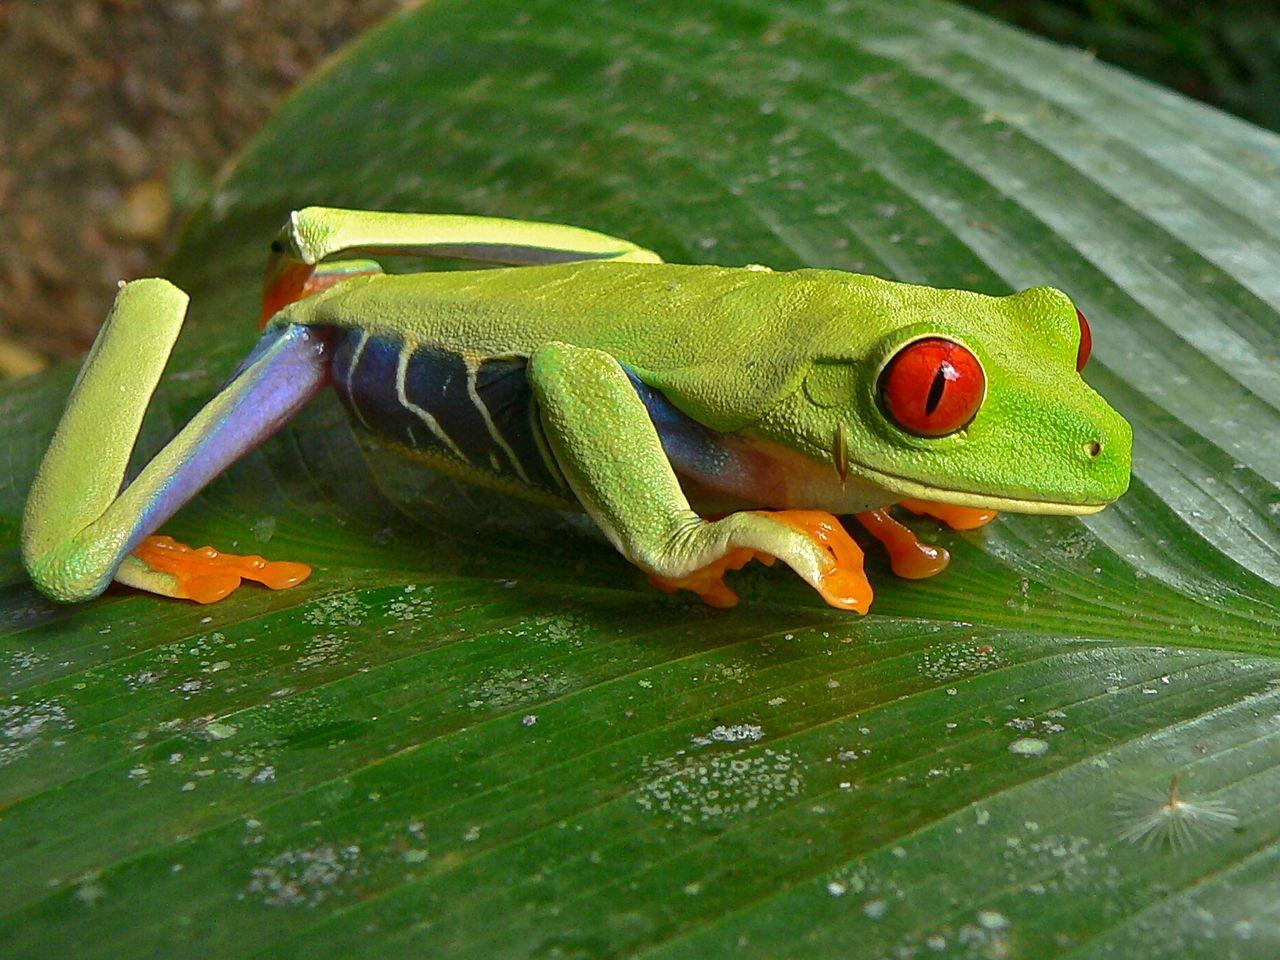 grenouille rainette yeux rouge